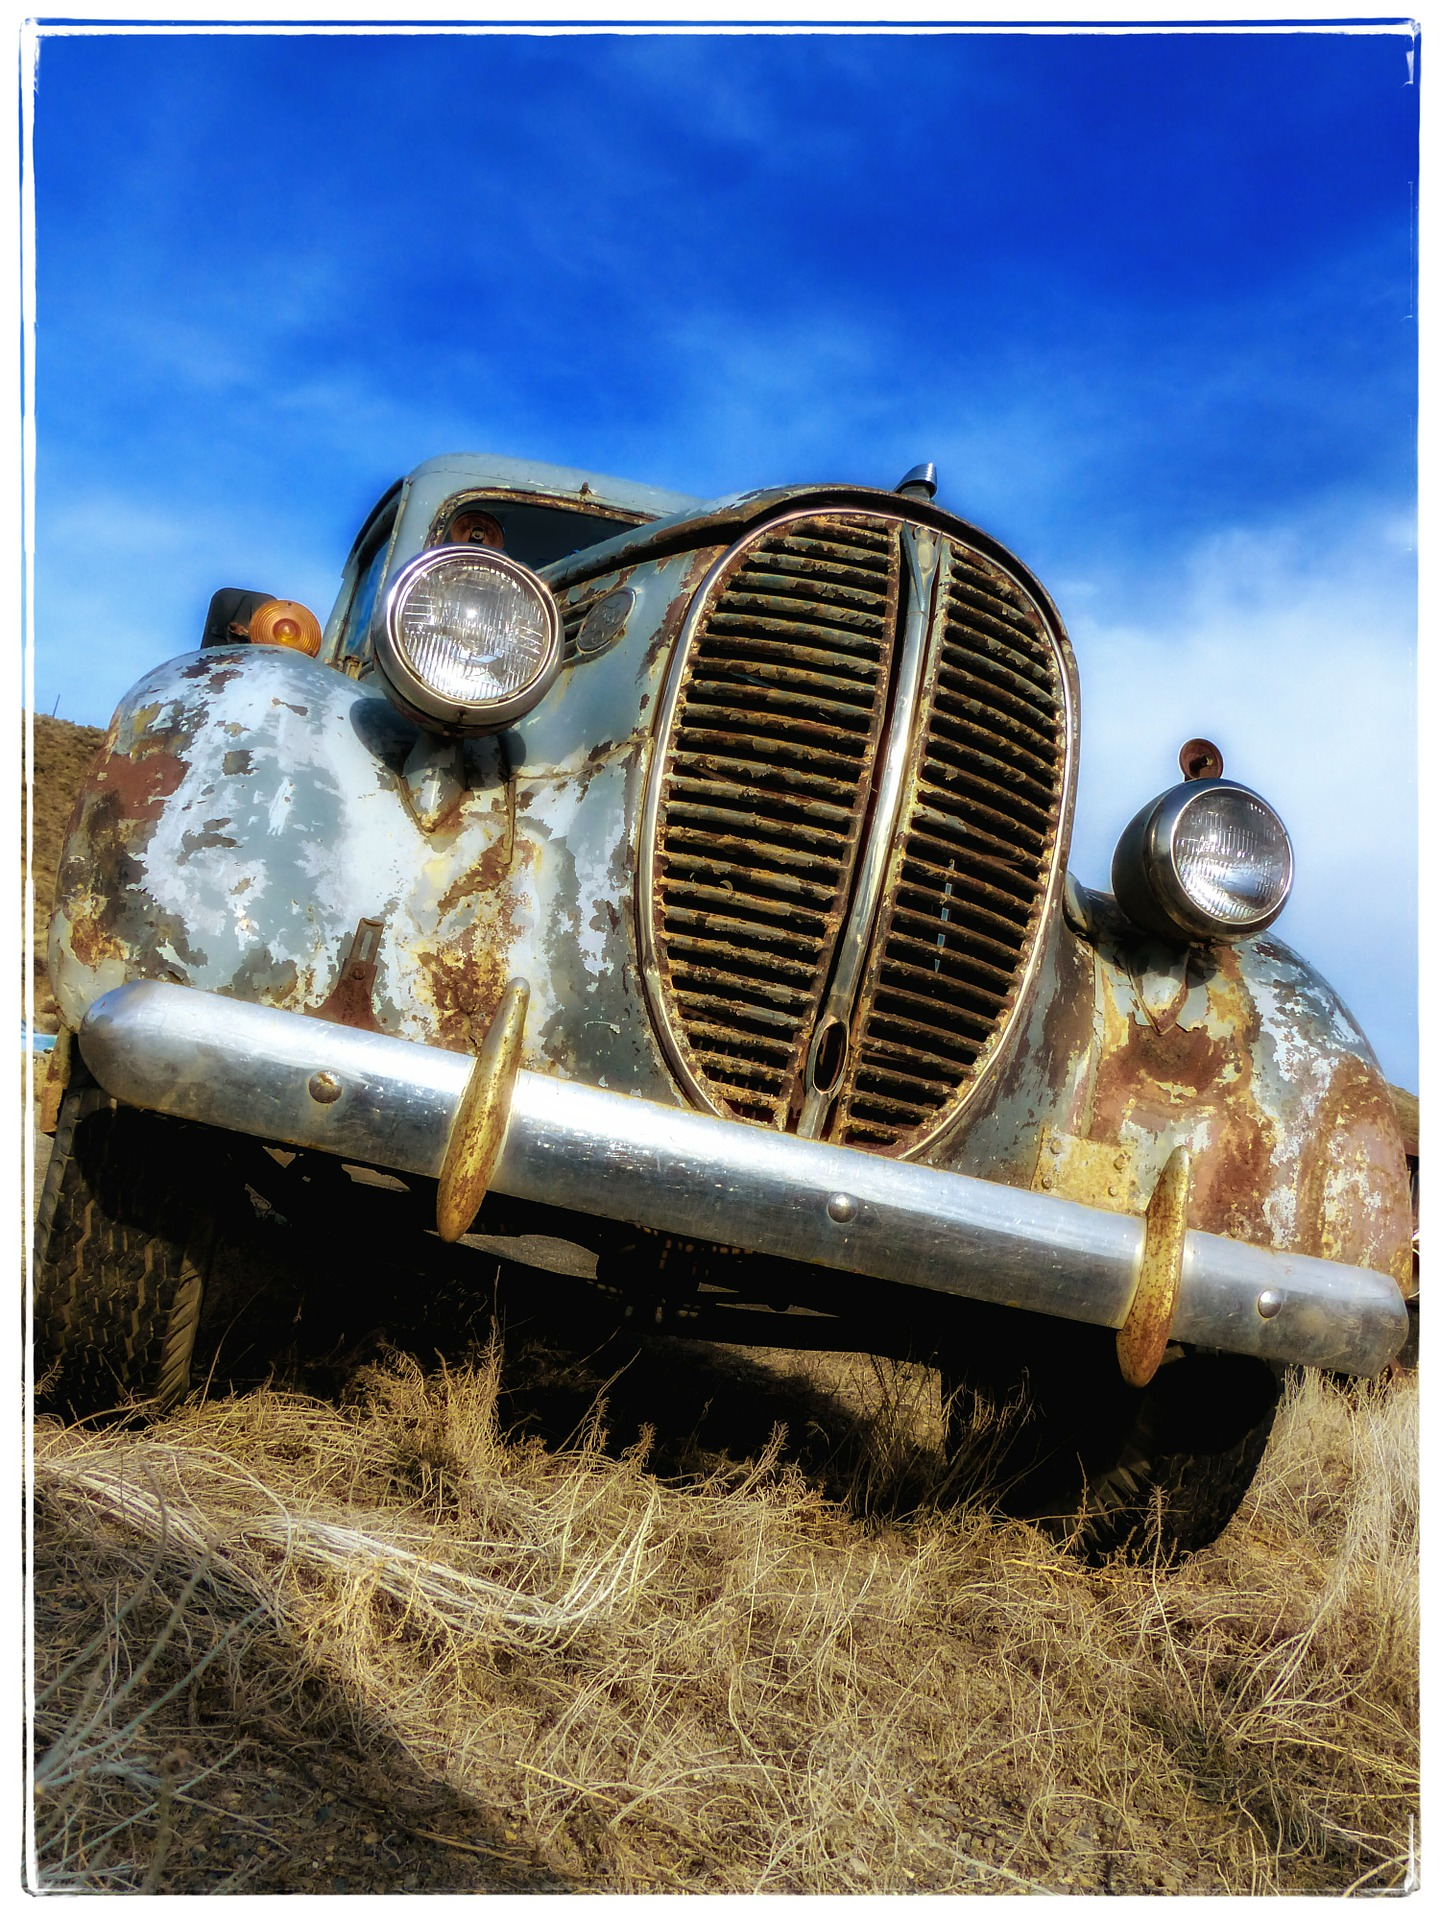 junk cars for cash no title near Medford MA